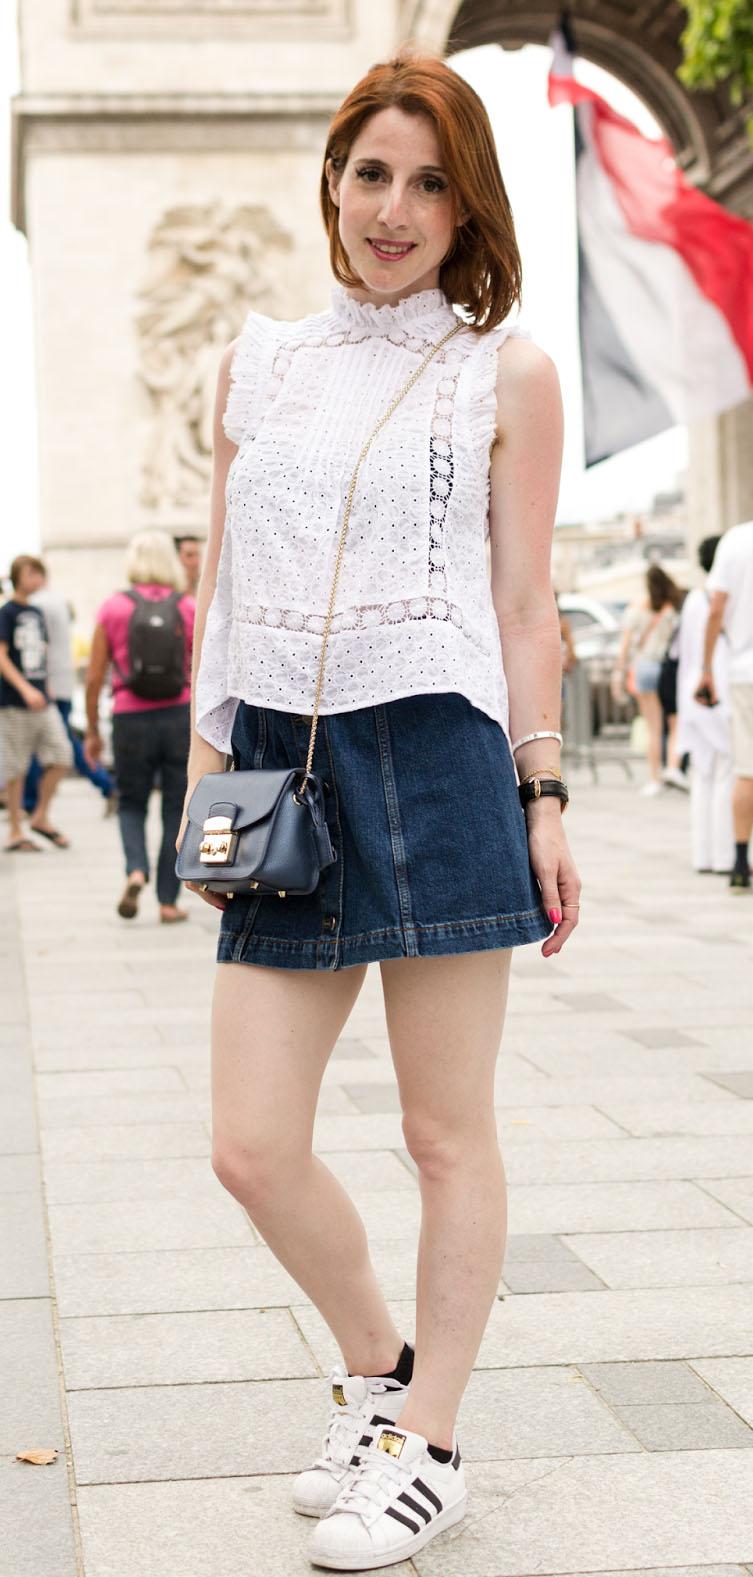 blue-navy-mini-skirt-white-top-black-bag-white-shoe-sneakers-spring-summer-hairr-weekend.jpg